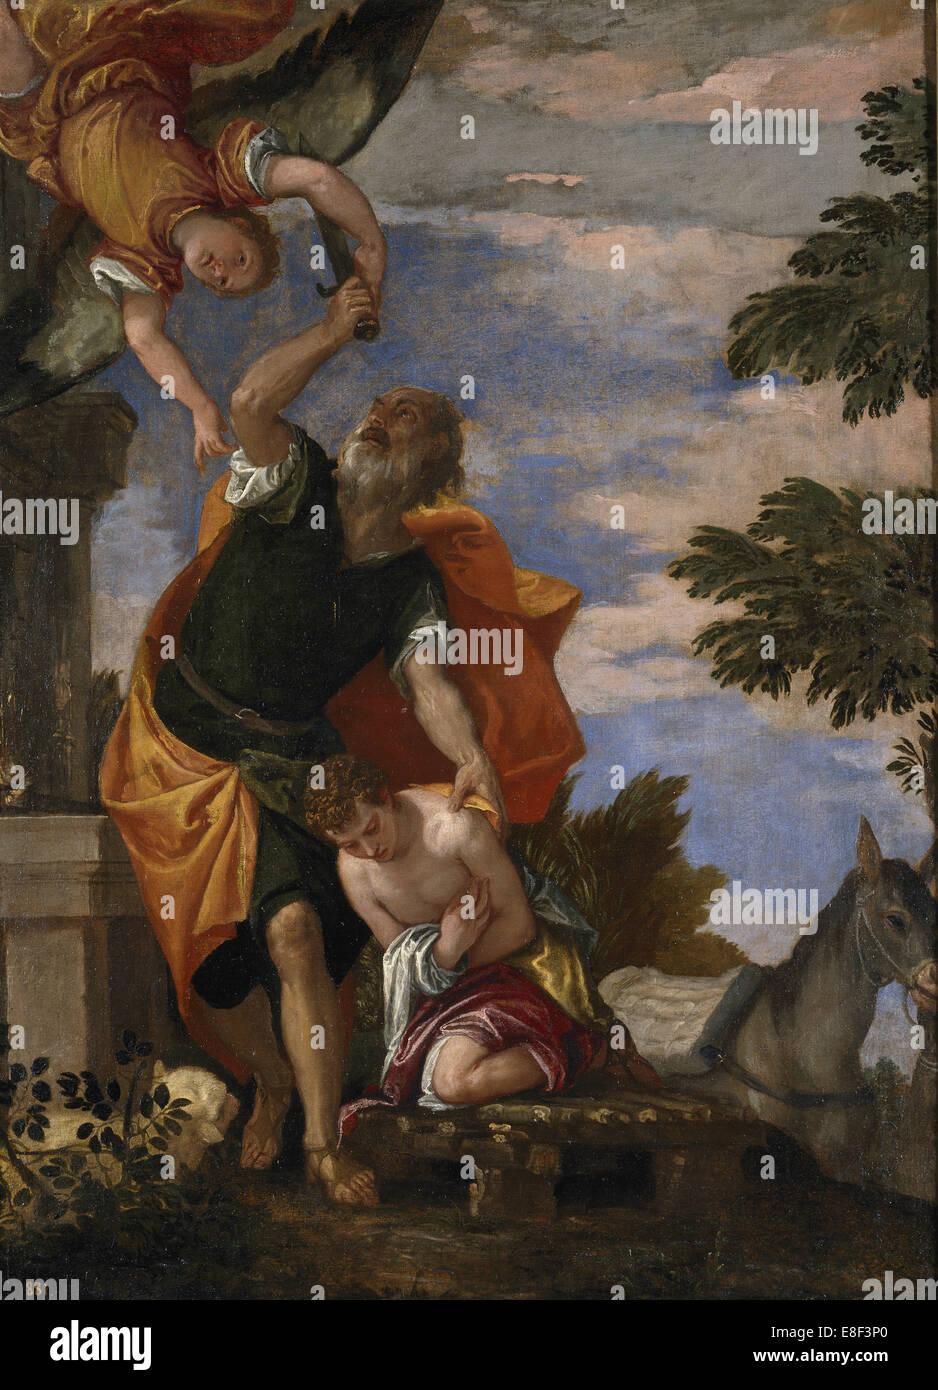 The Sacrifice of Isaac. Artist: Veronese, Paolo (1528-1588) - Stock Image